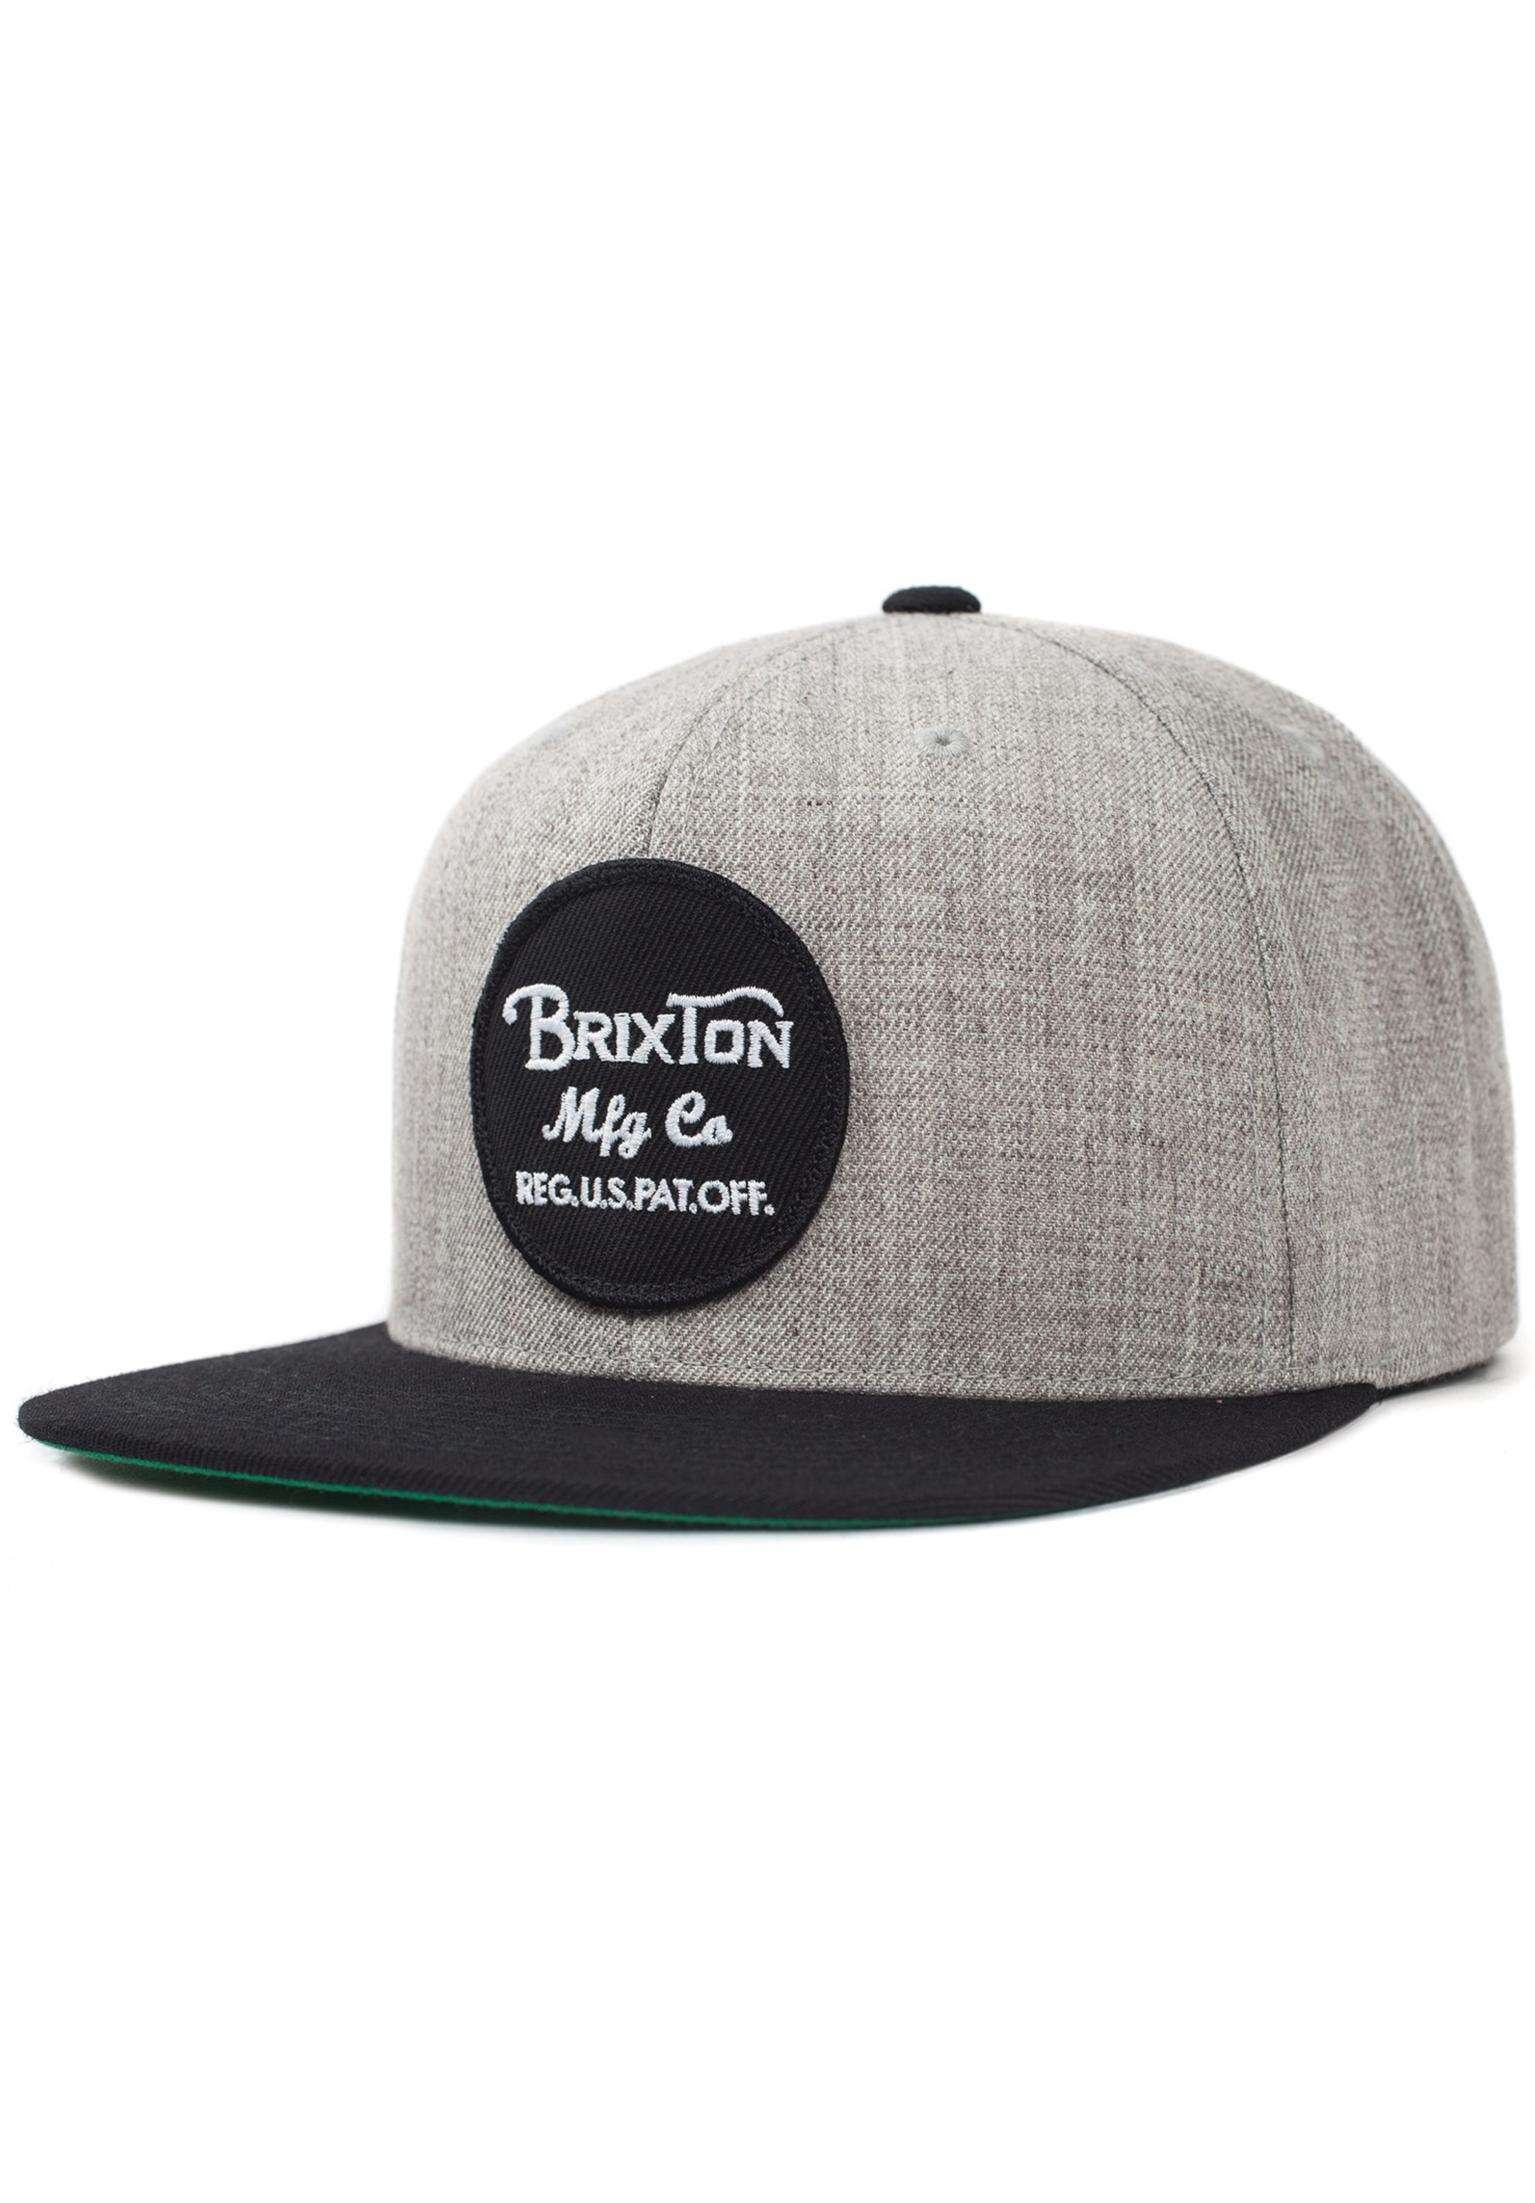 54286e1eb6f Wheeler Brixton Caps in lightheathergrey-black for Men